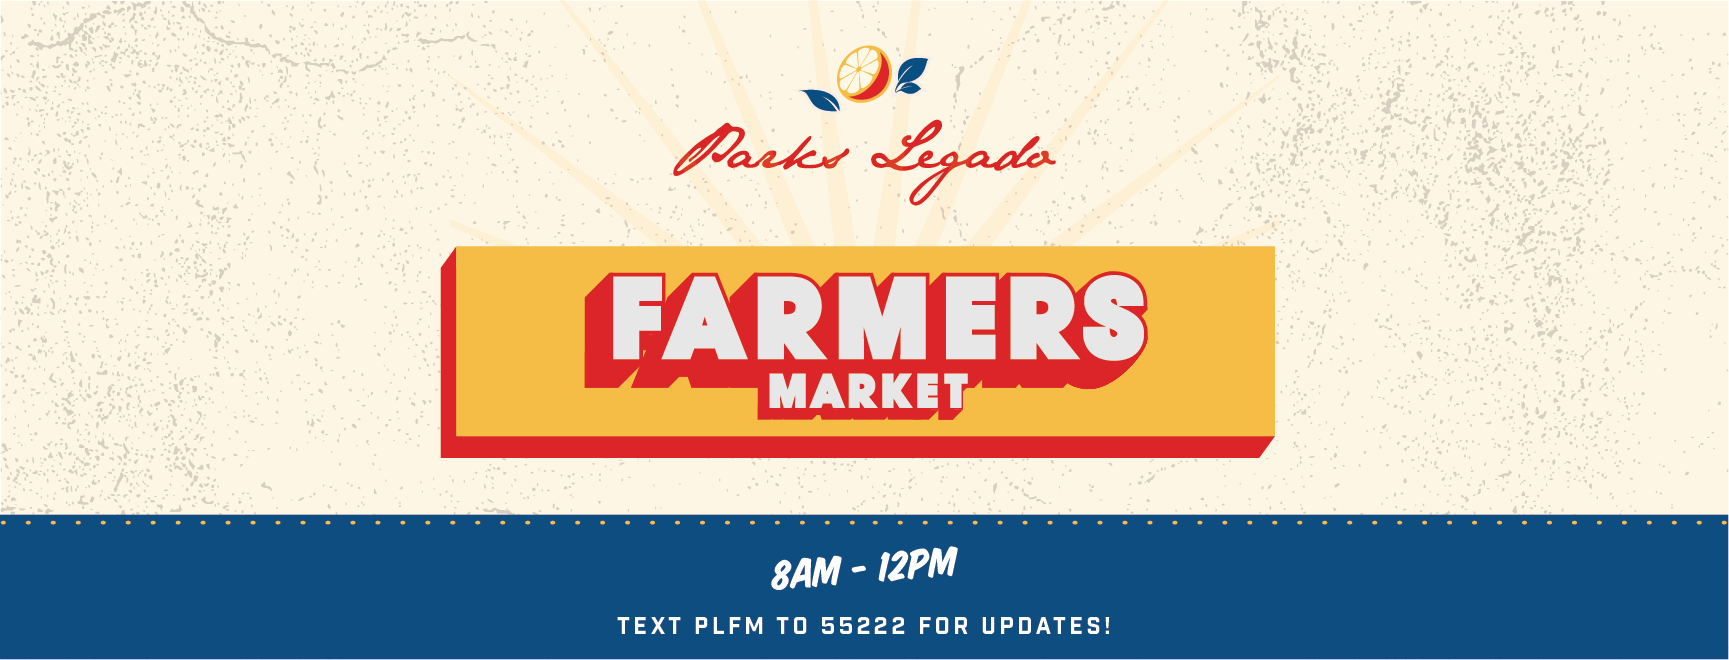 Farmers Market 2019 Website-09.png